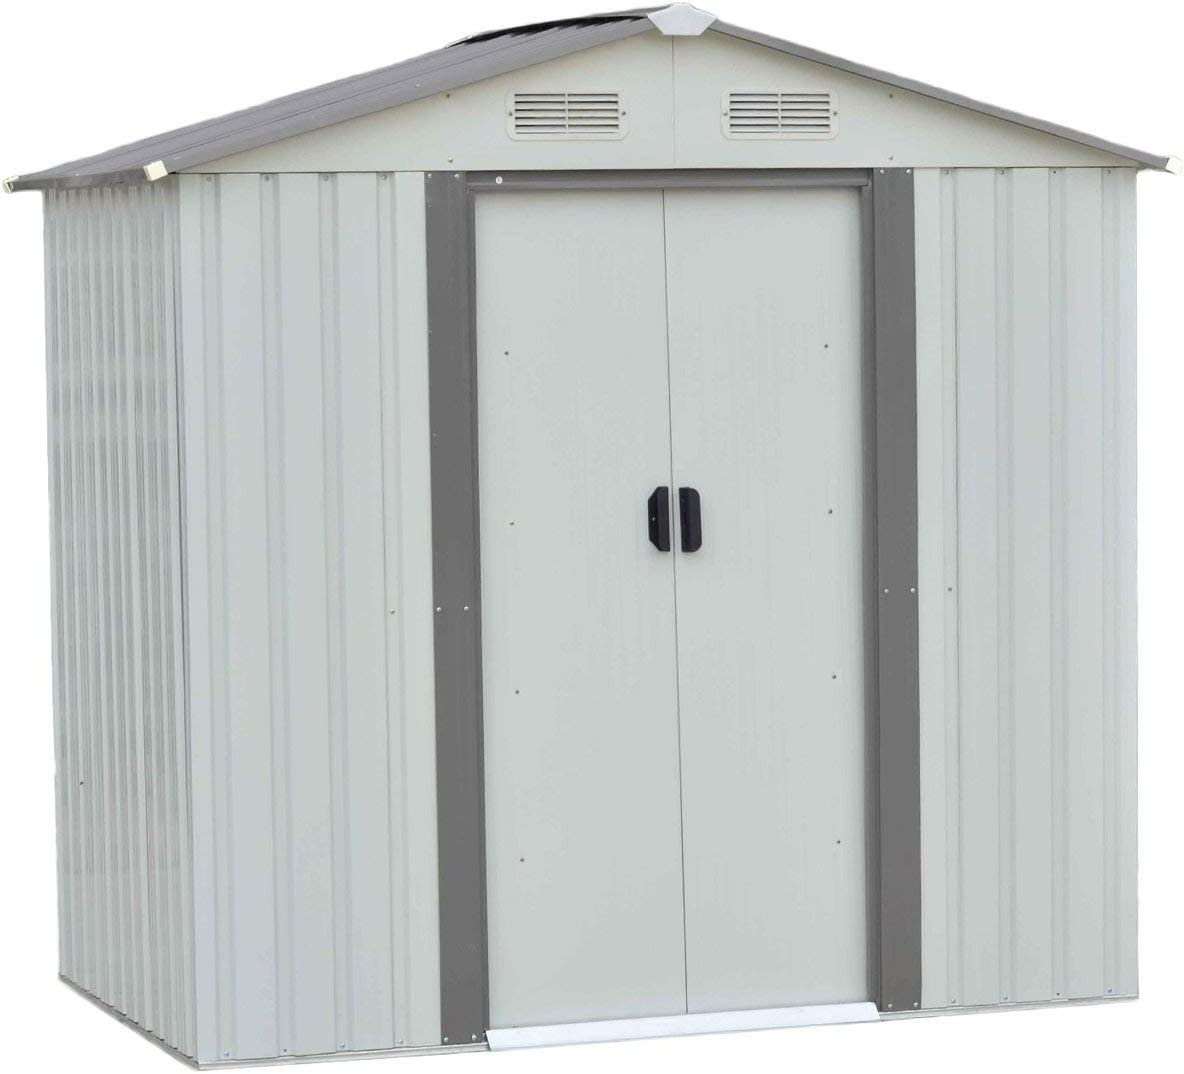 Metal Garden Tools stored in Persistent Storage Yard Maintenance-Free All-Weather Waterproof Metal Garden shed,5 x 4